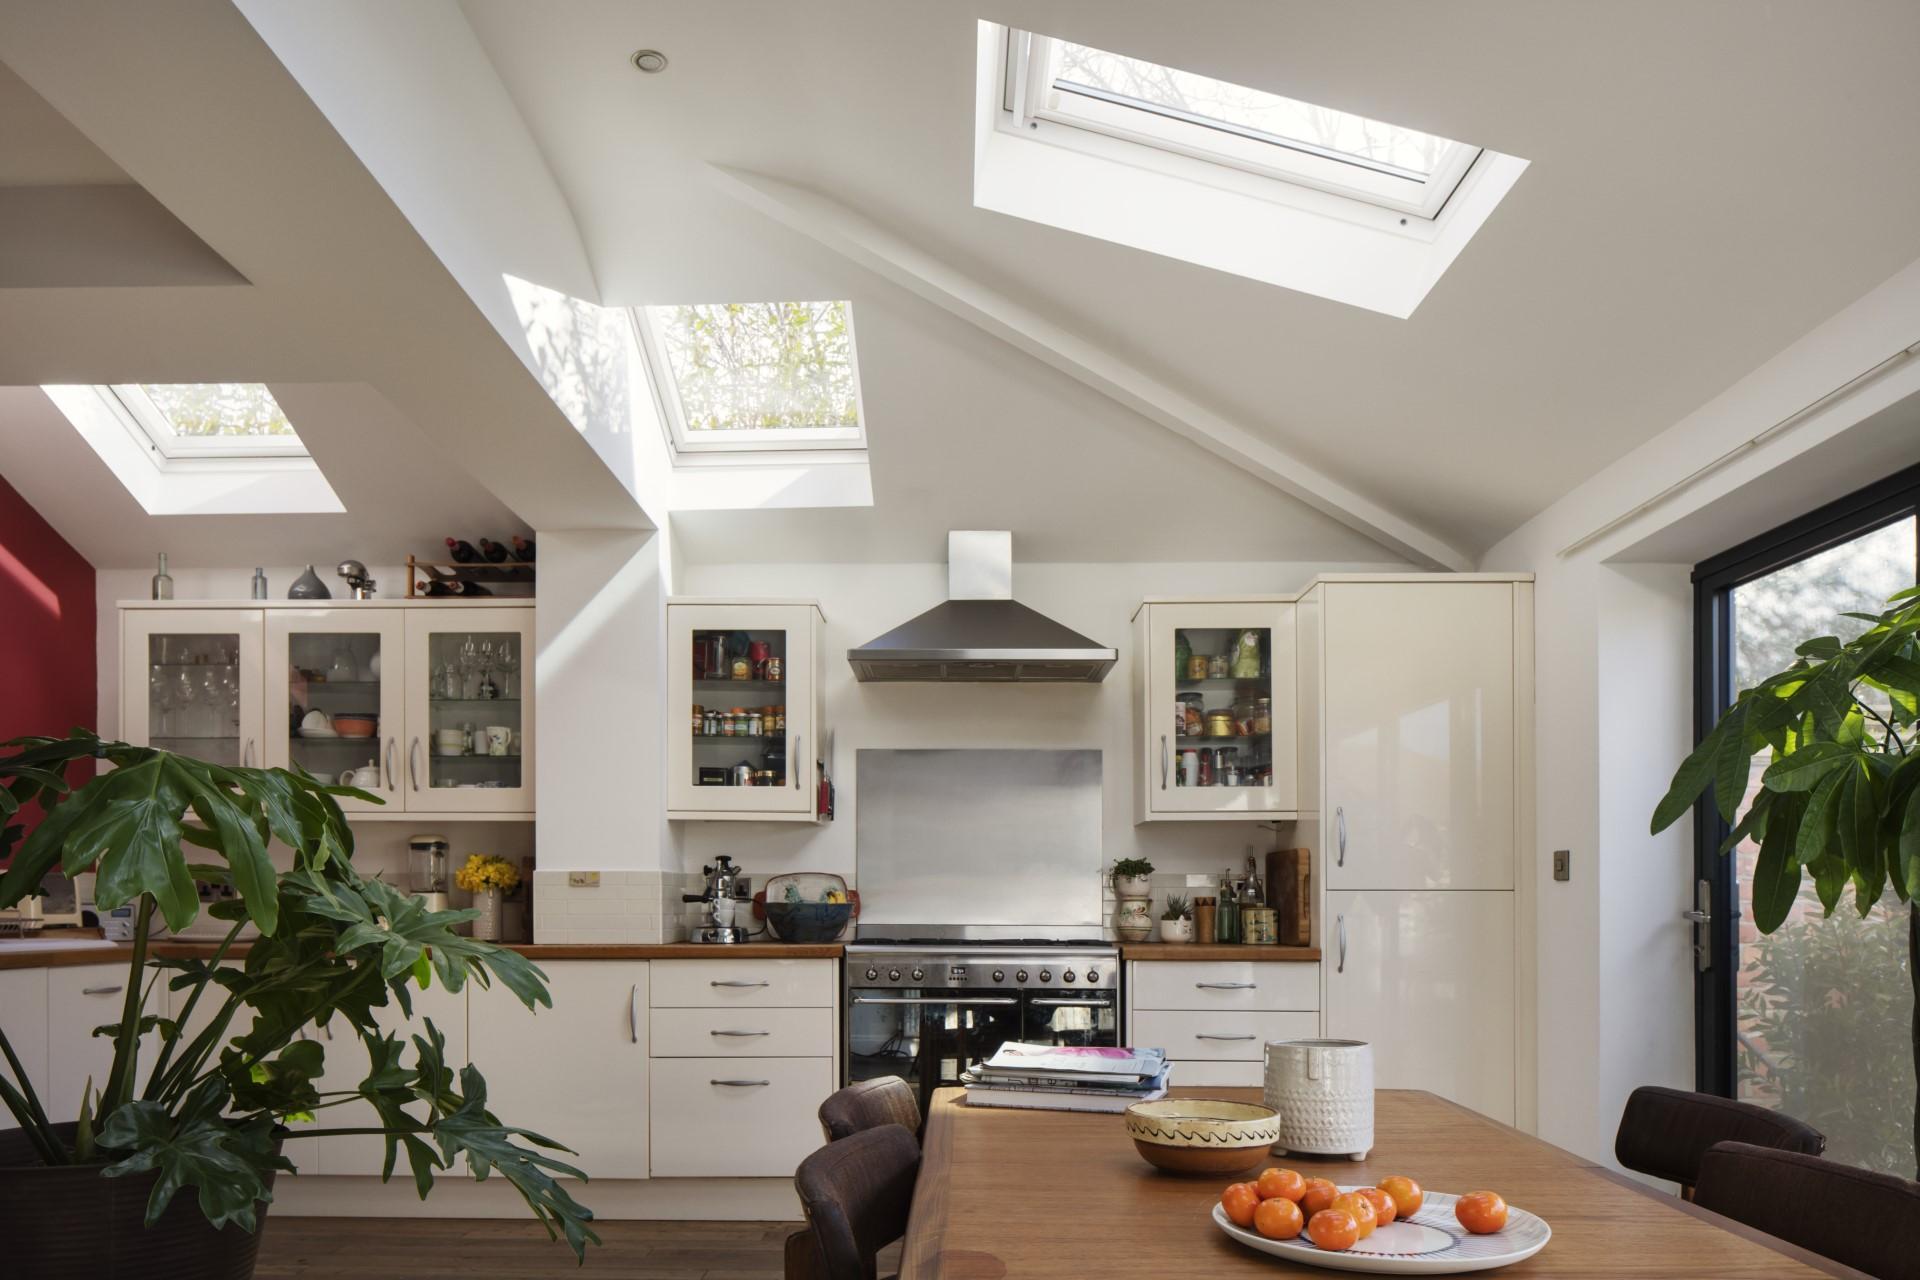 cucina con finestre - Mansarda.it